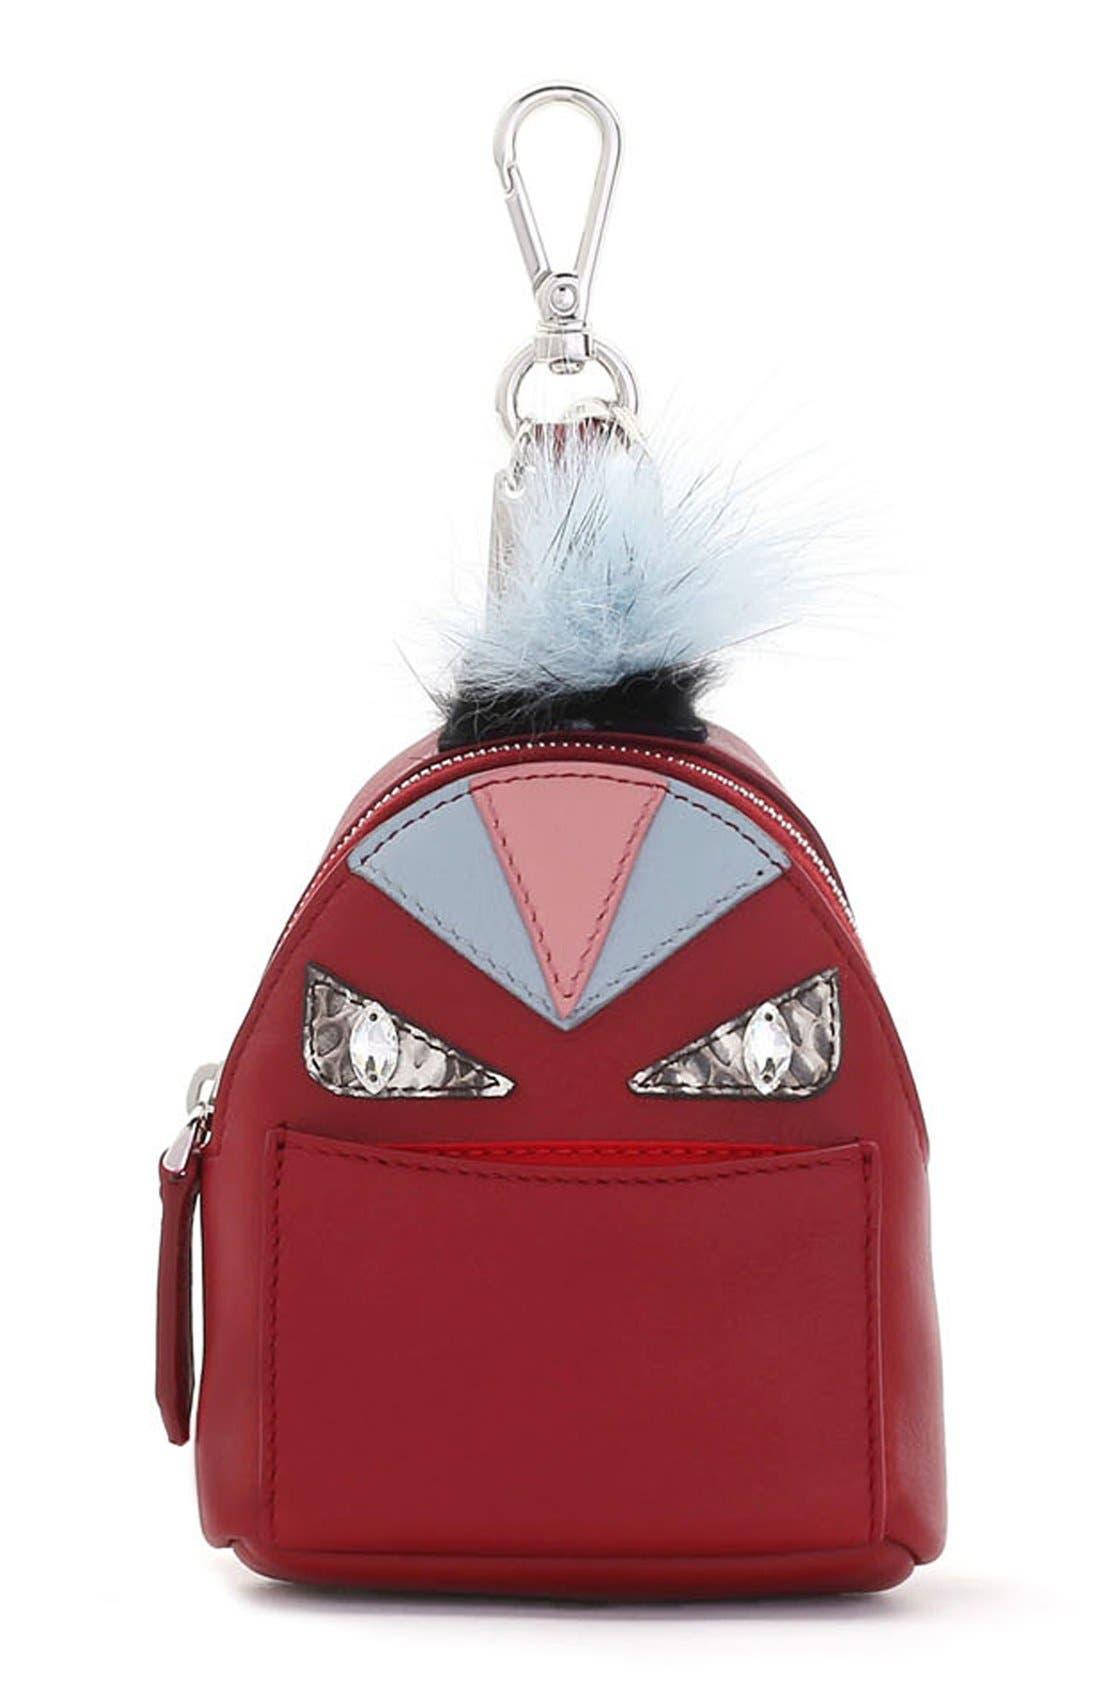 Alternate Image 1 Selected - Fendi 'Monster' Genuine Fox Fur Trim Backpack Bag Charm